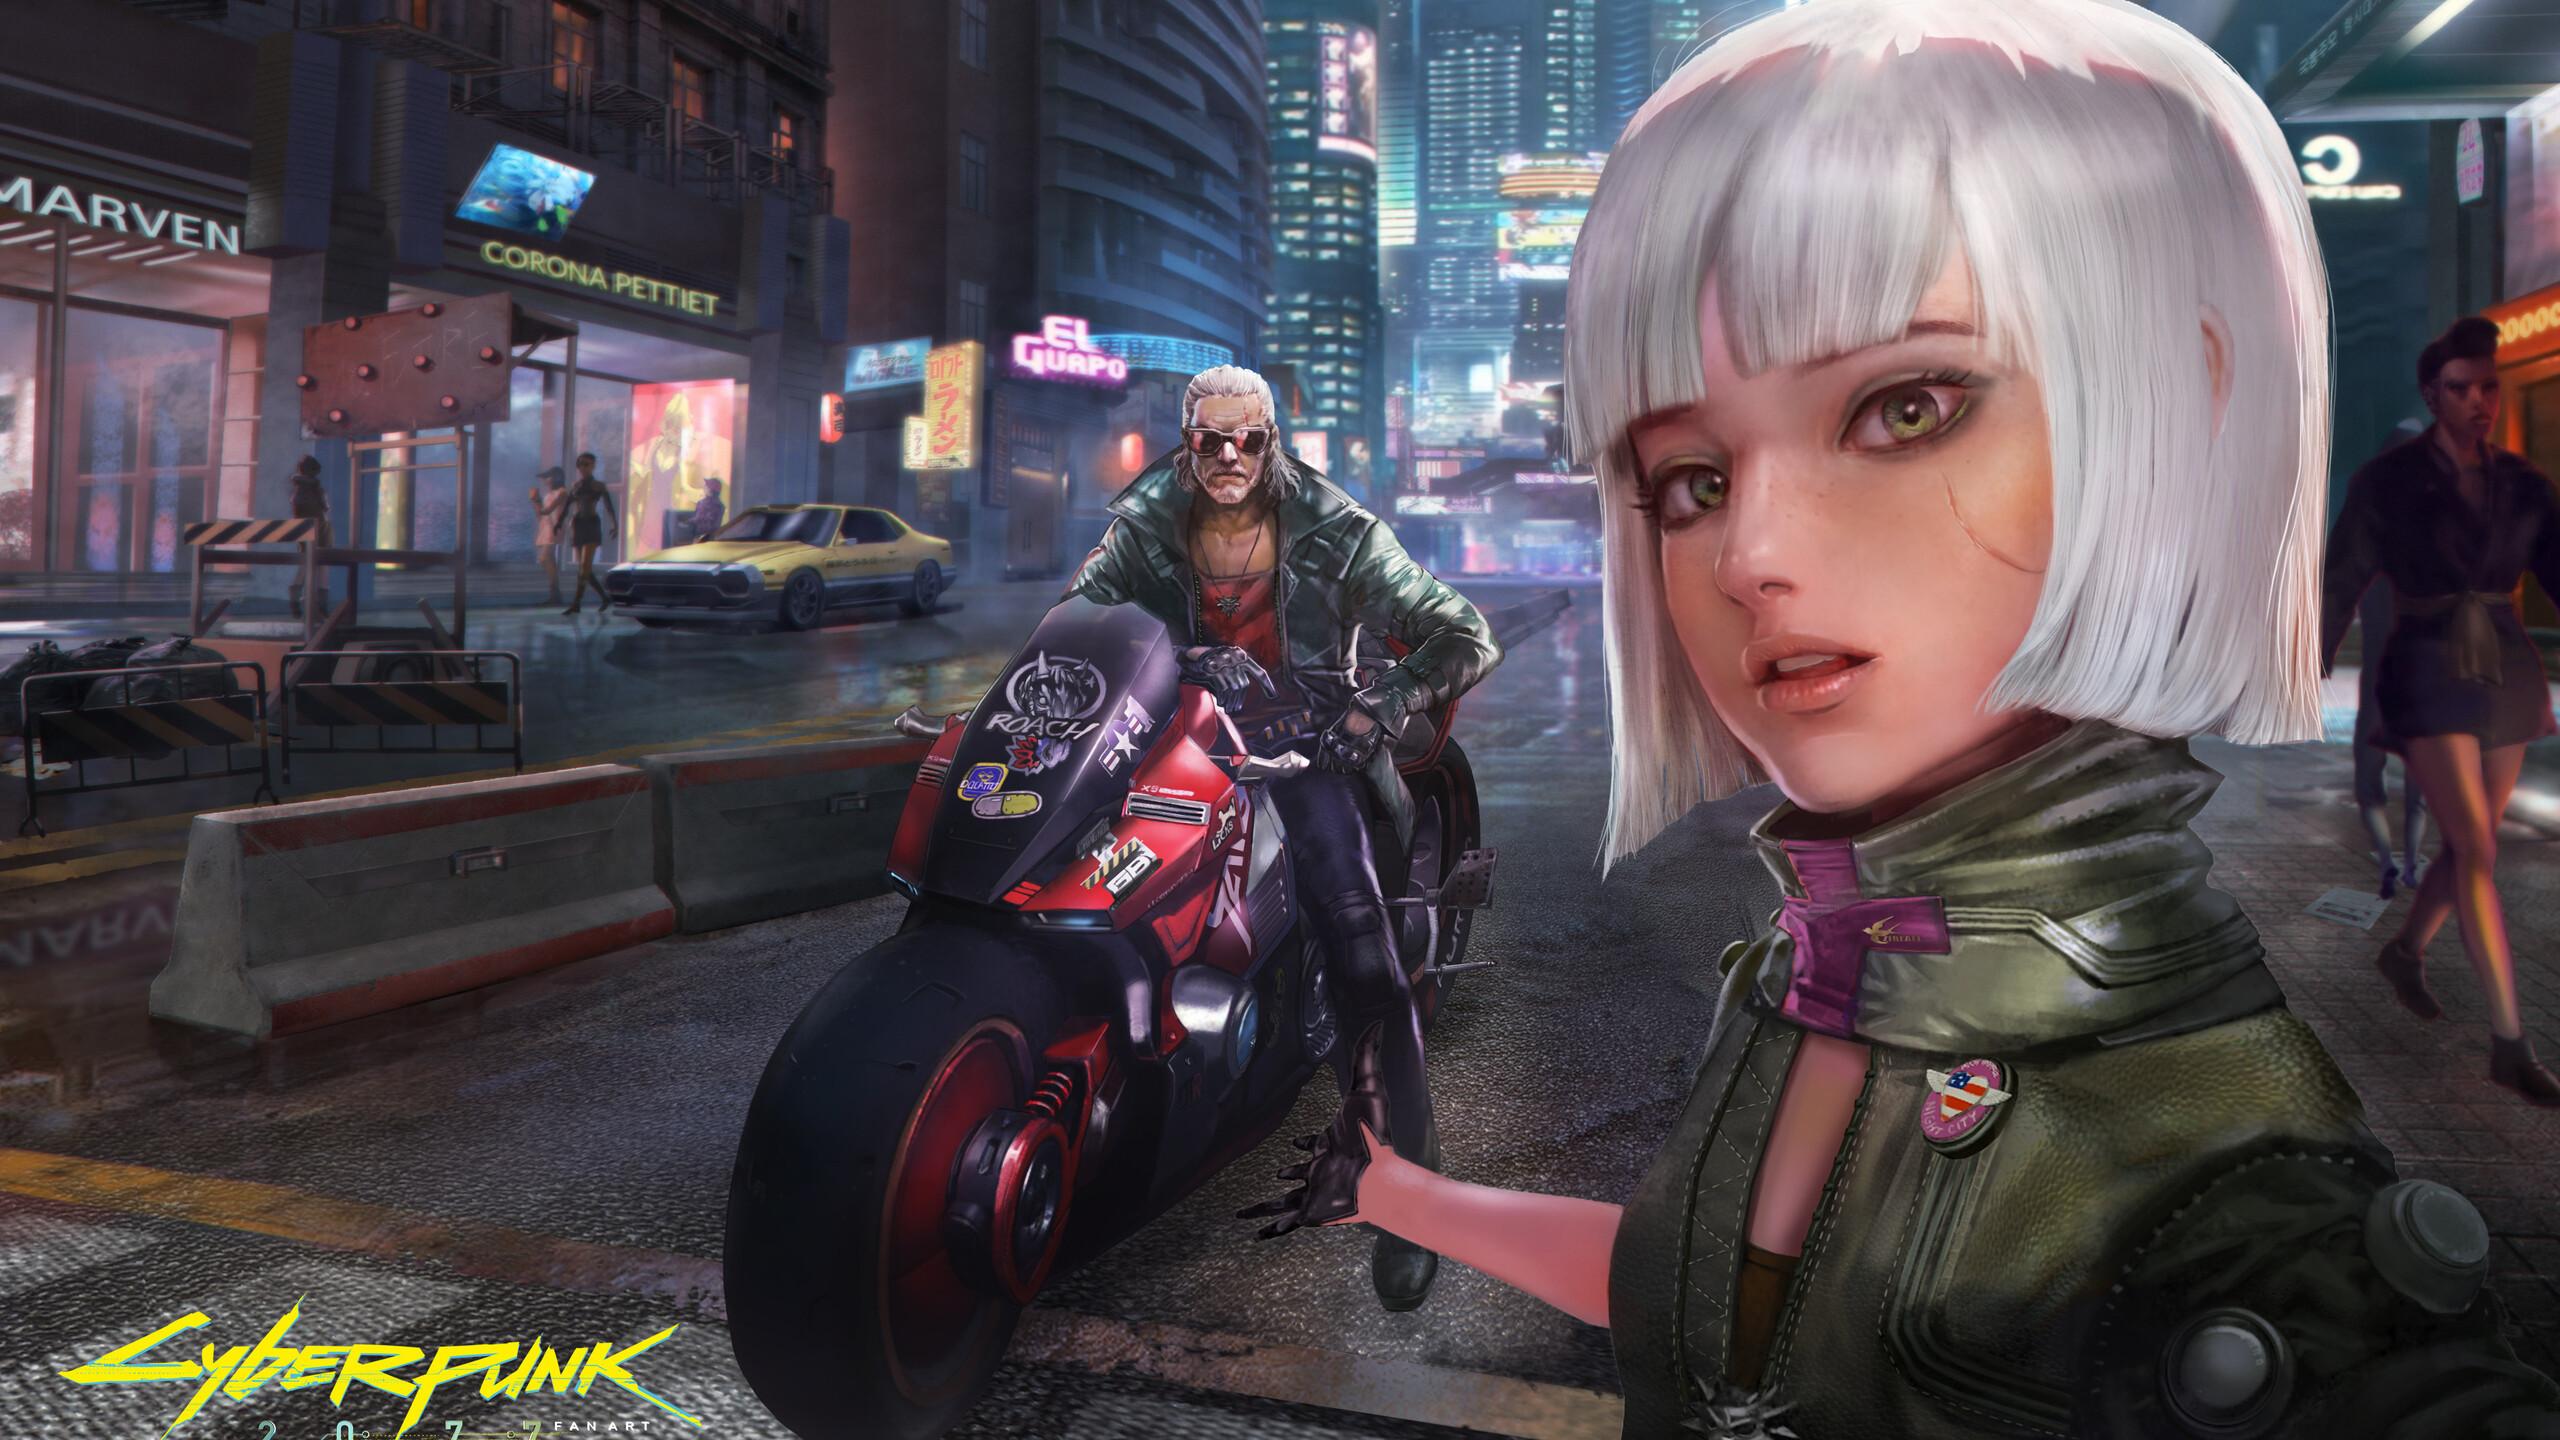 strangers-in-night-city-cyberpunk-2077-0i.jpg